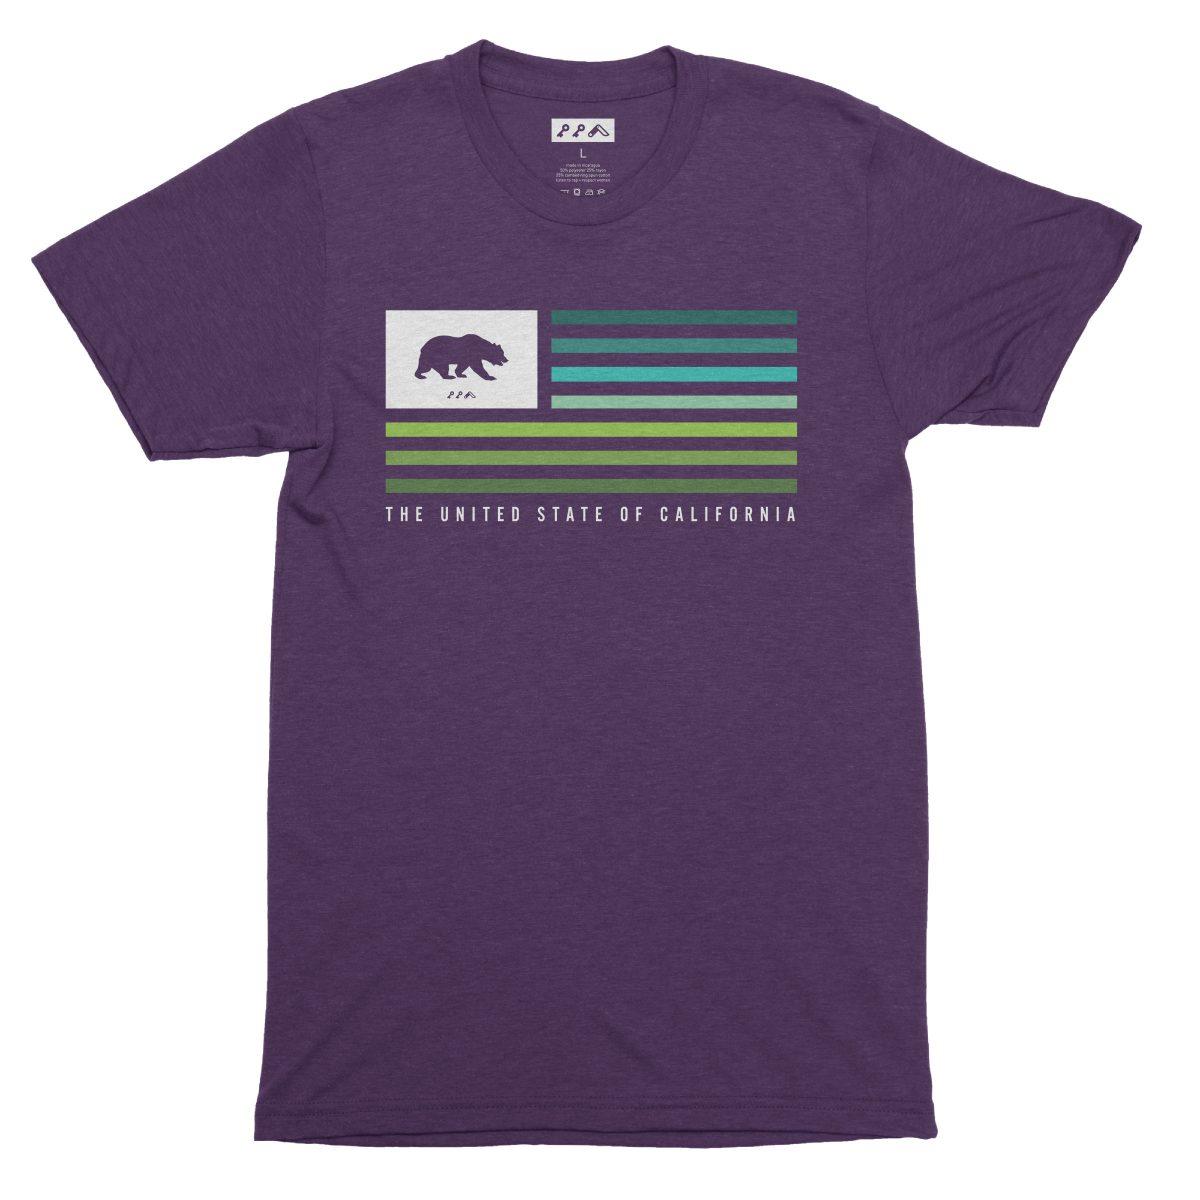 UNITED STATE OF CALIFORNIA music festival summer beach tshirt in purple